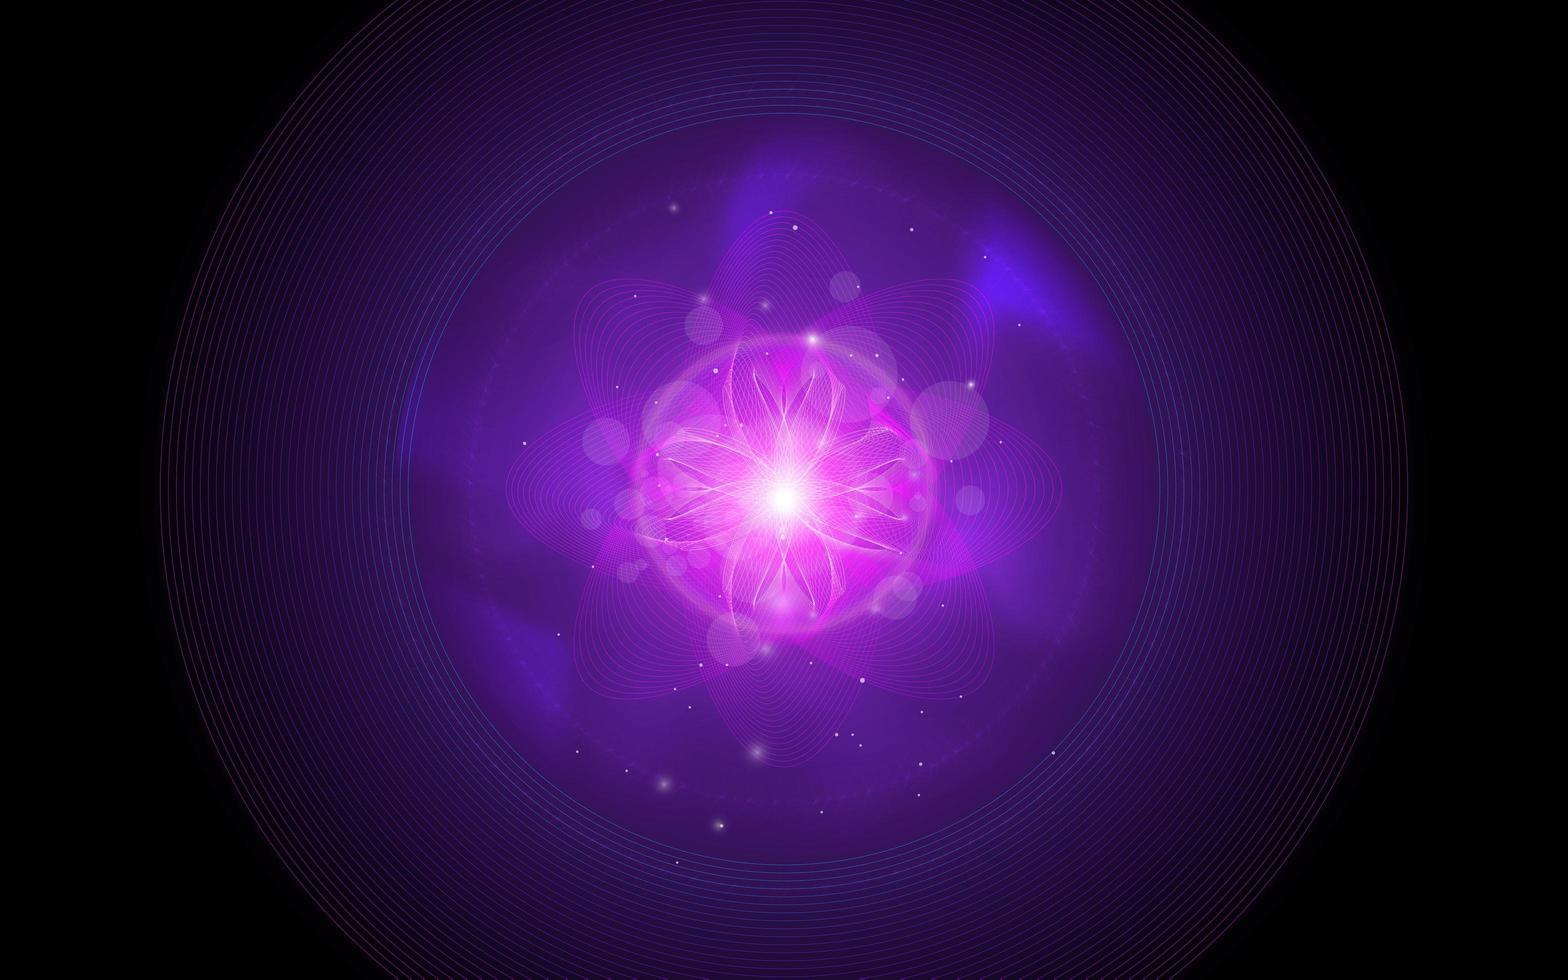 abstracte violette bloemachtergrond vector